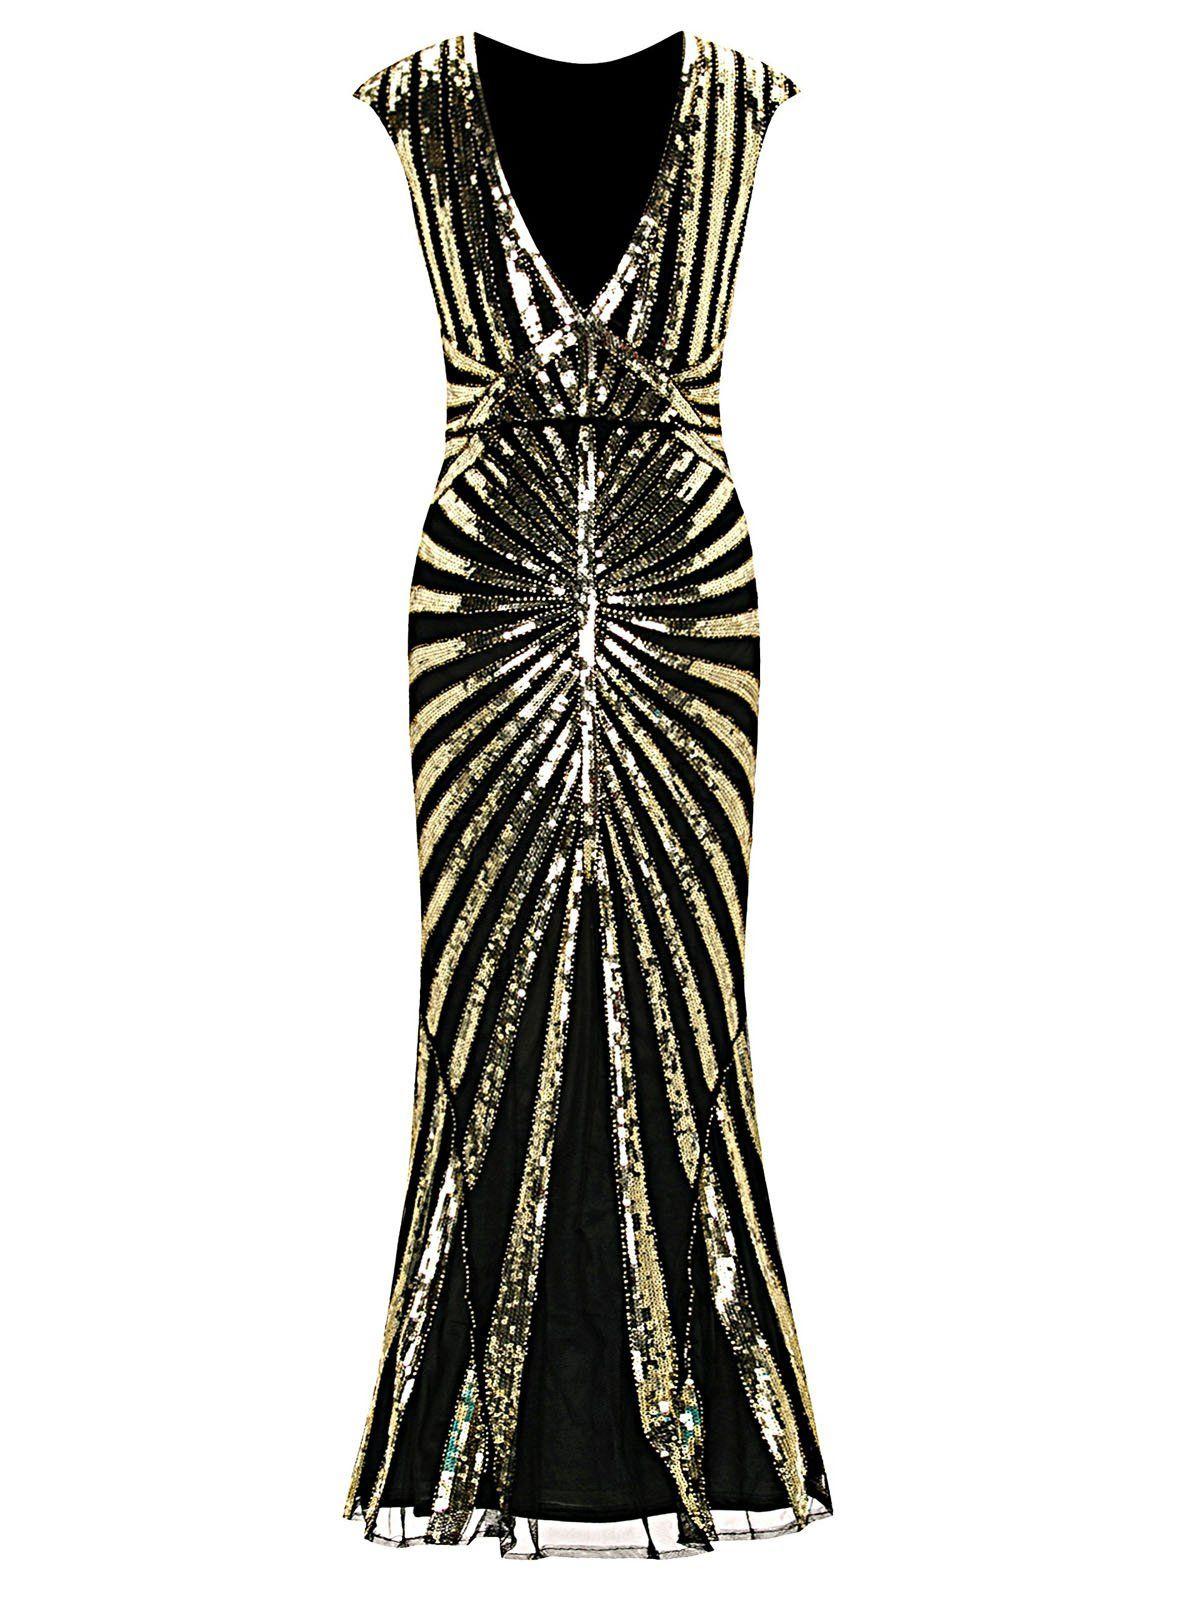 6030e057547 1920s Sequin Art Deco Maxi Dress – Retro Stage - Chic Vintage Dresses and  Accessories